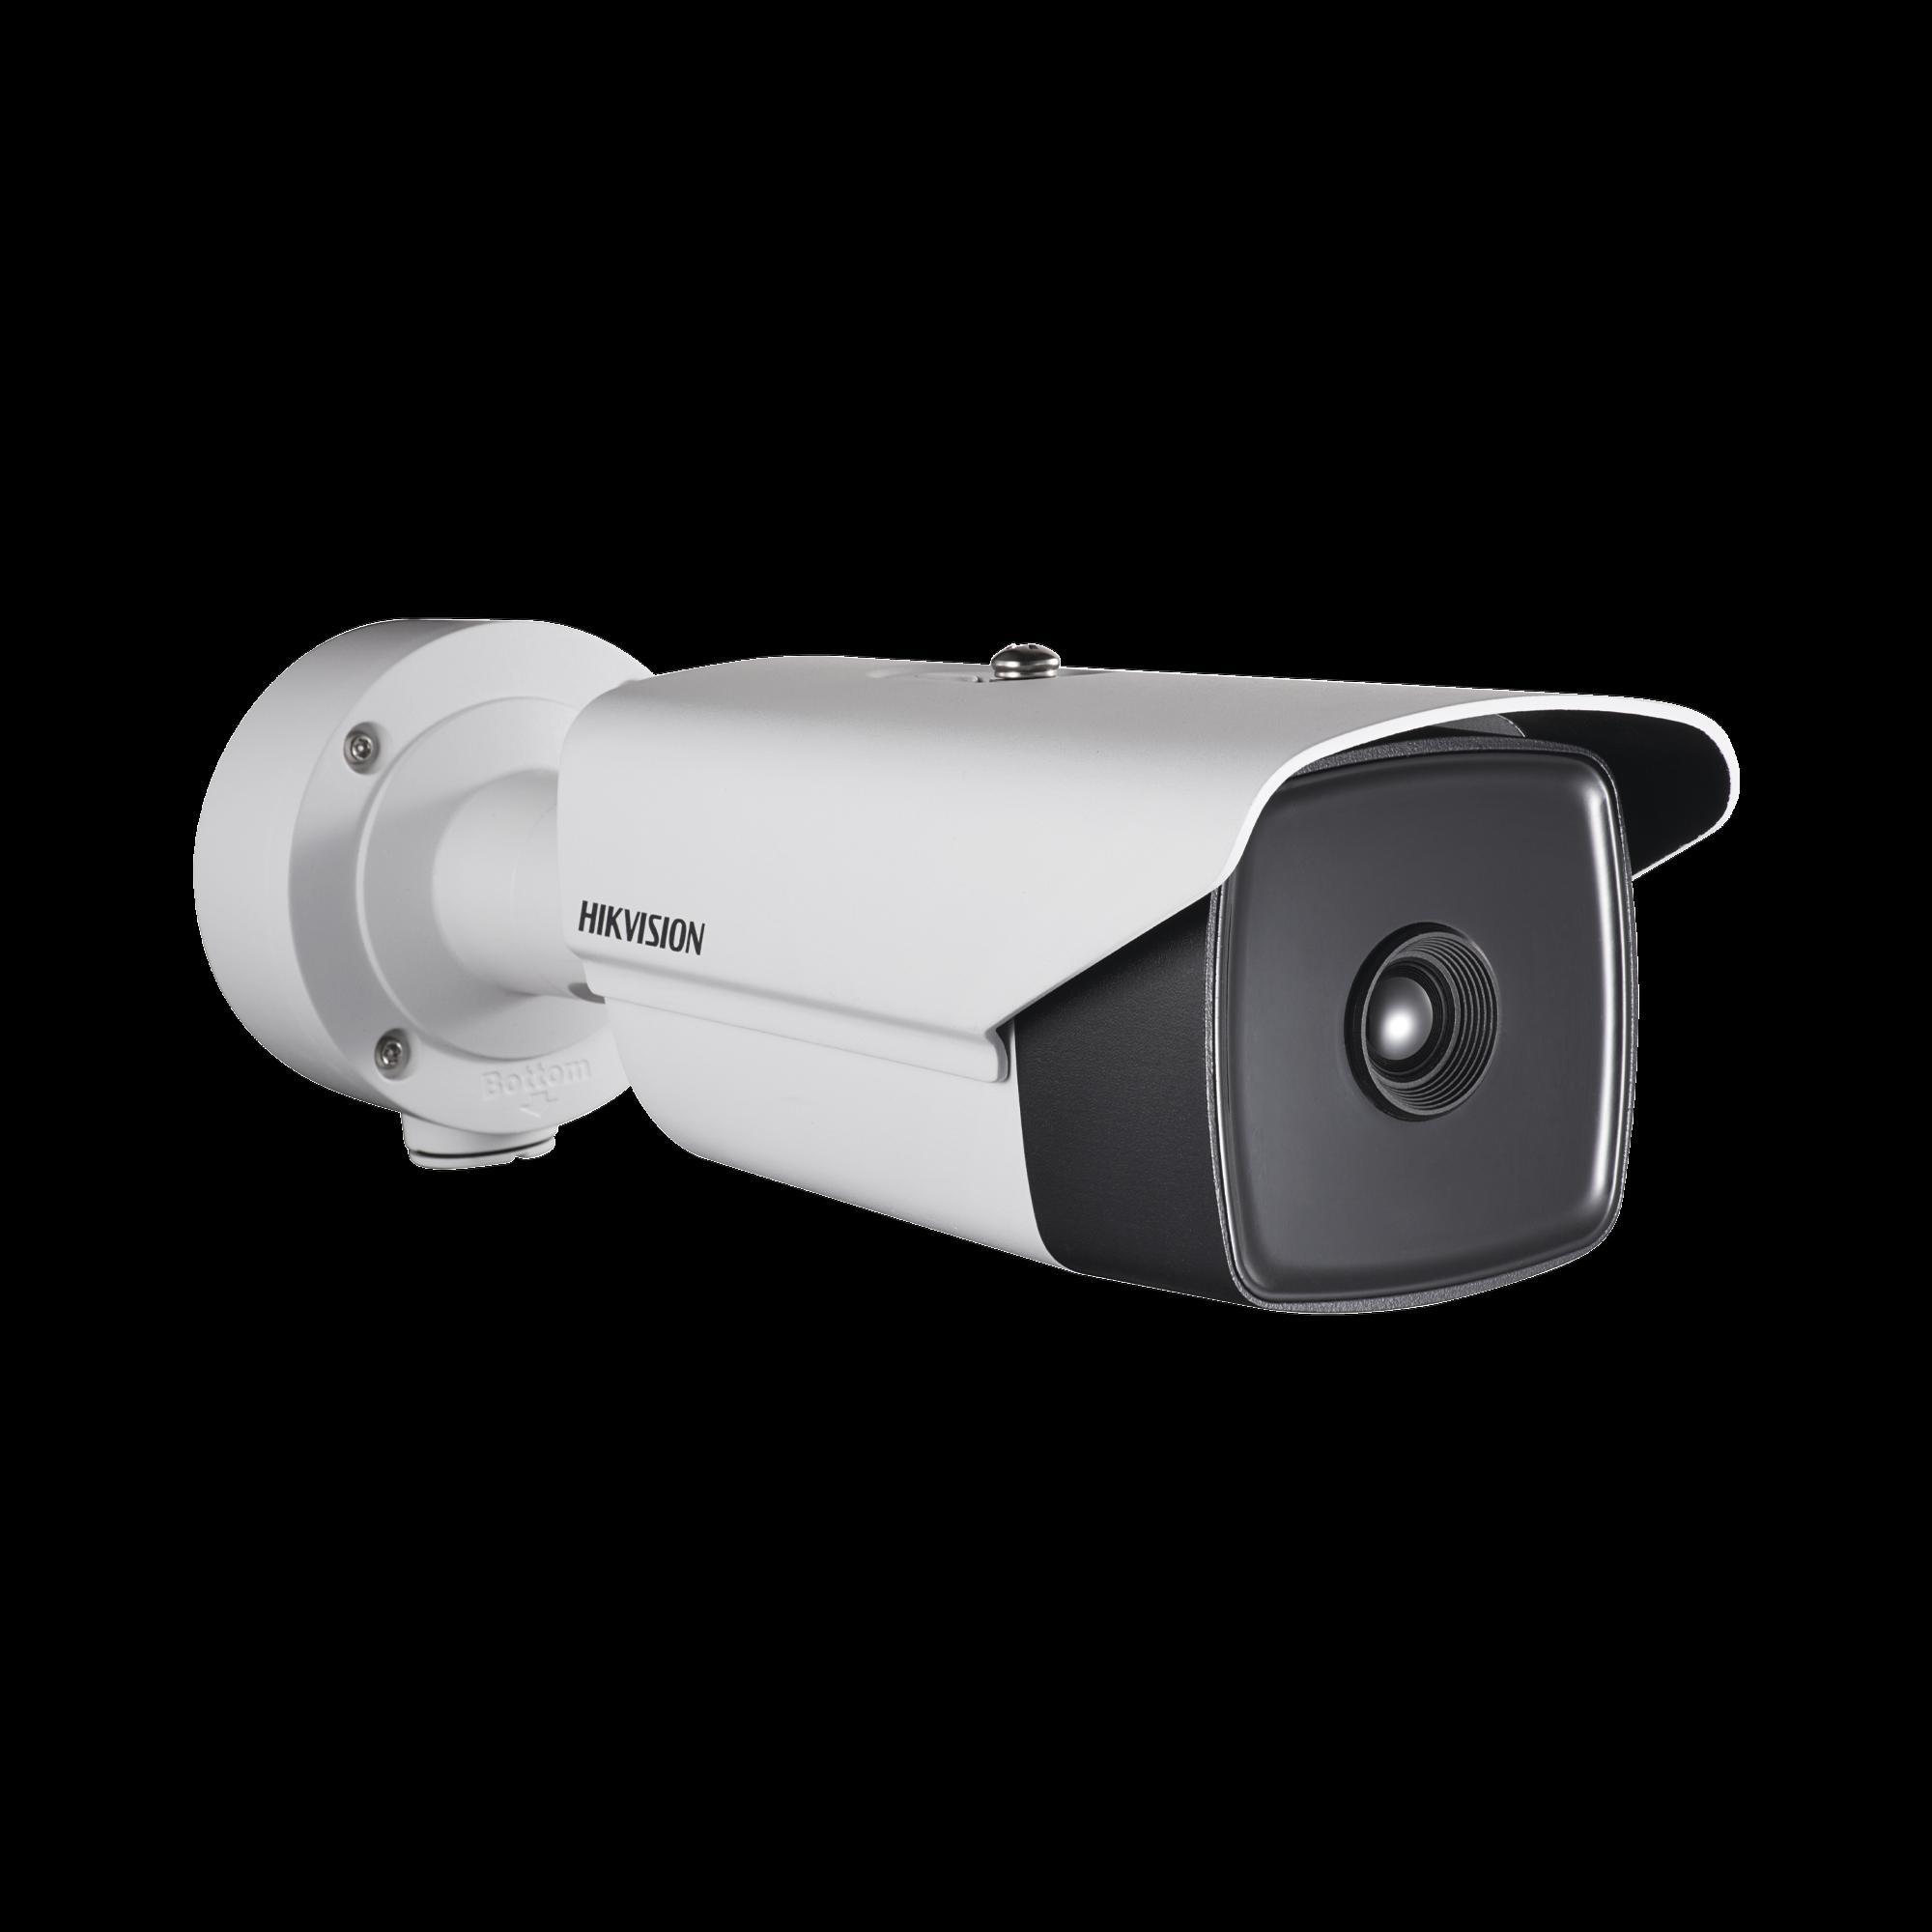 Bala IP Termica 384 X 288 / Lente 25 mm / Termometrica / Deteccion de Temperatura / PoE+ / IP66